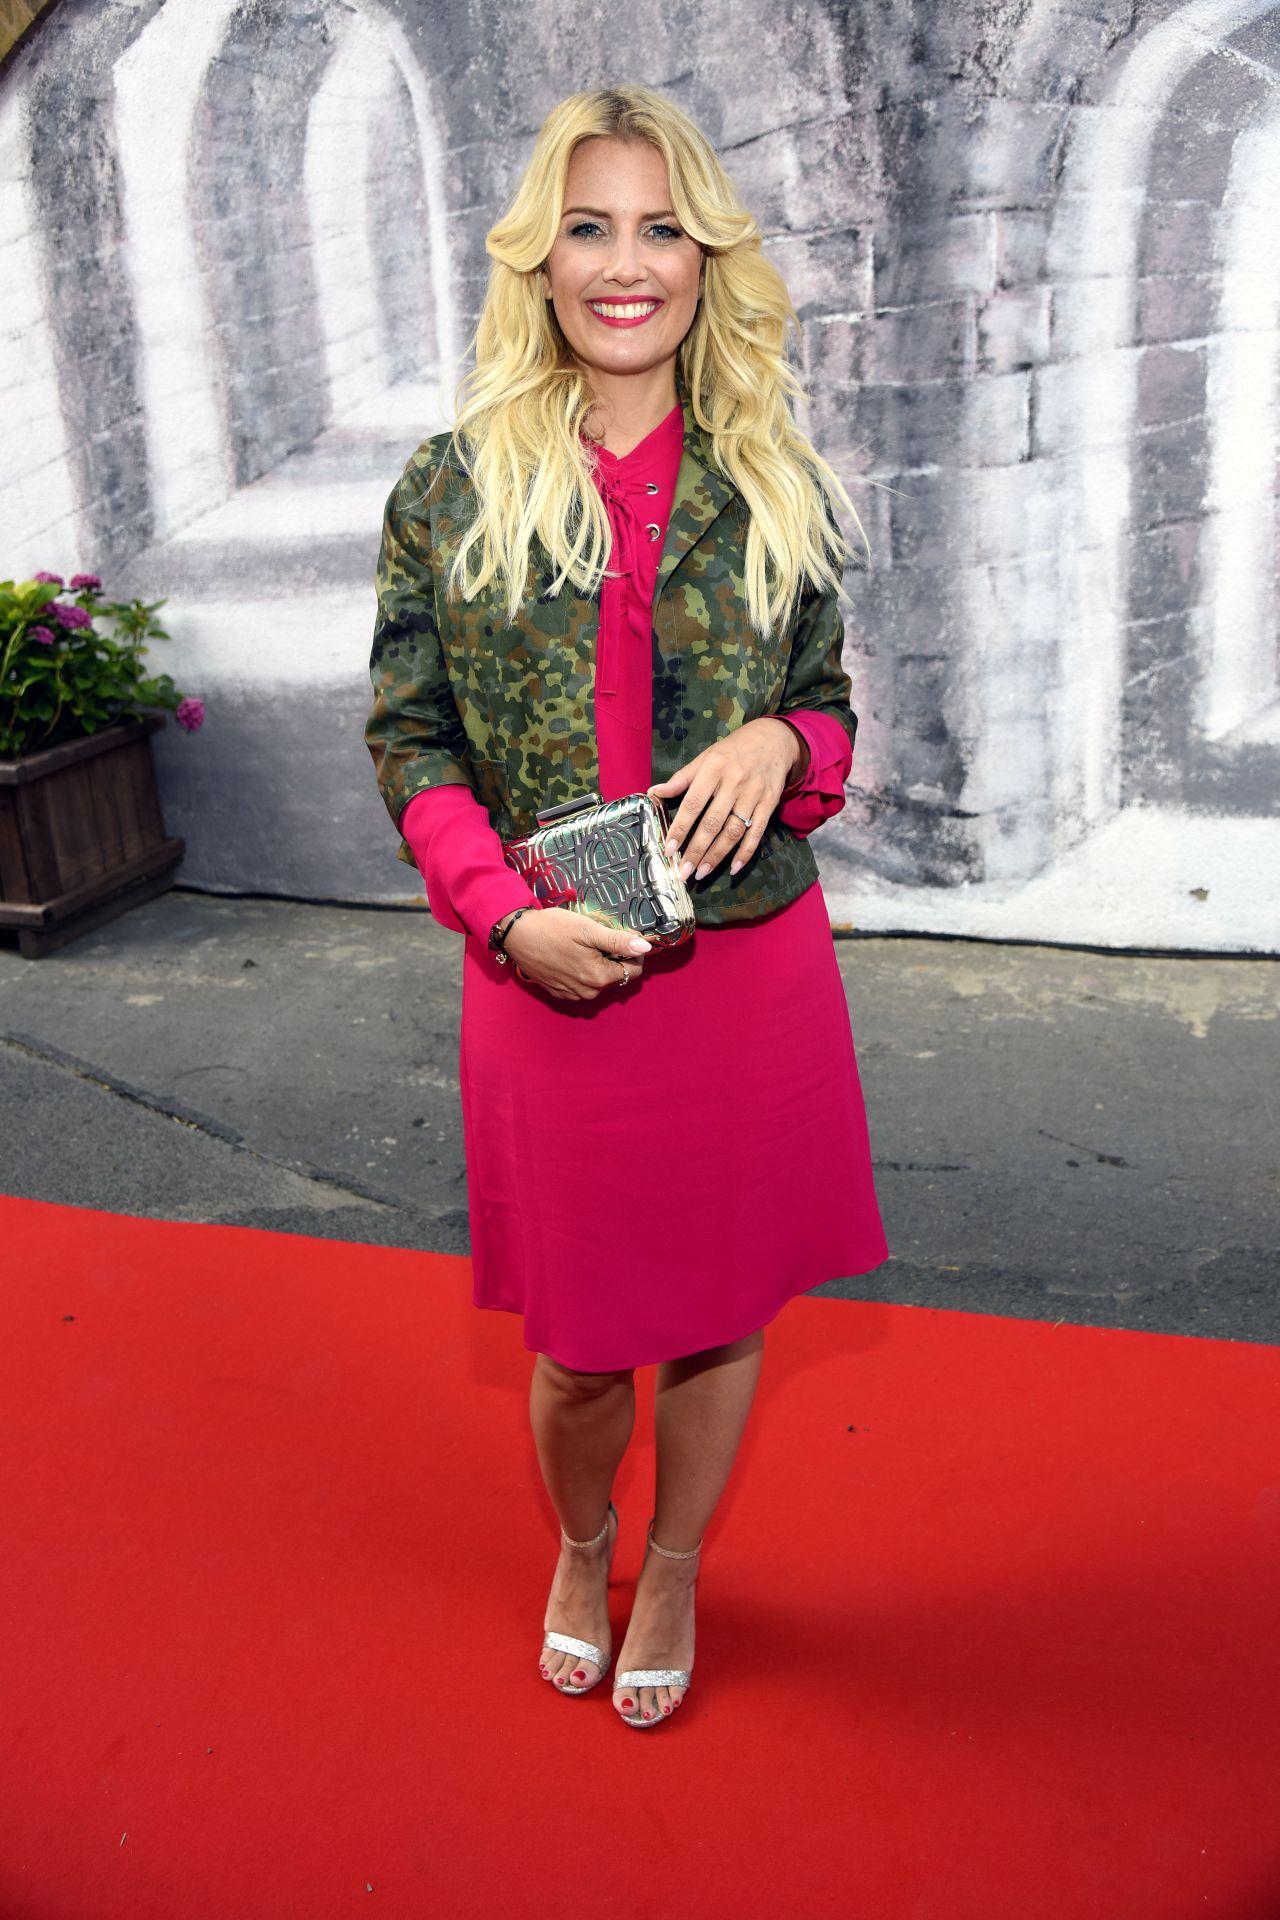 Jennifer knable at riani show mercedes benz fashion week berlin